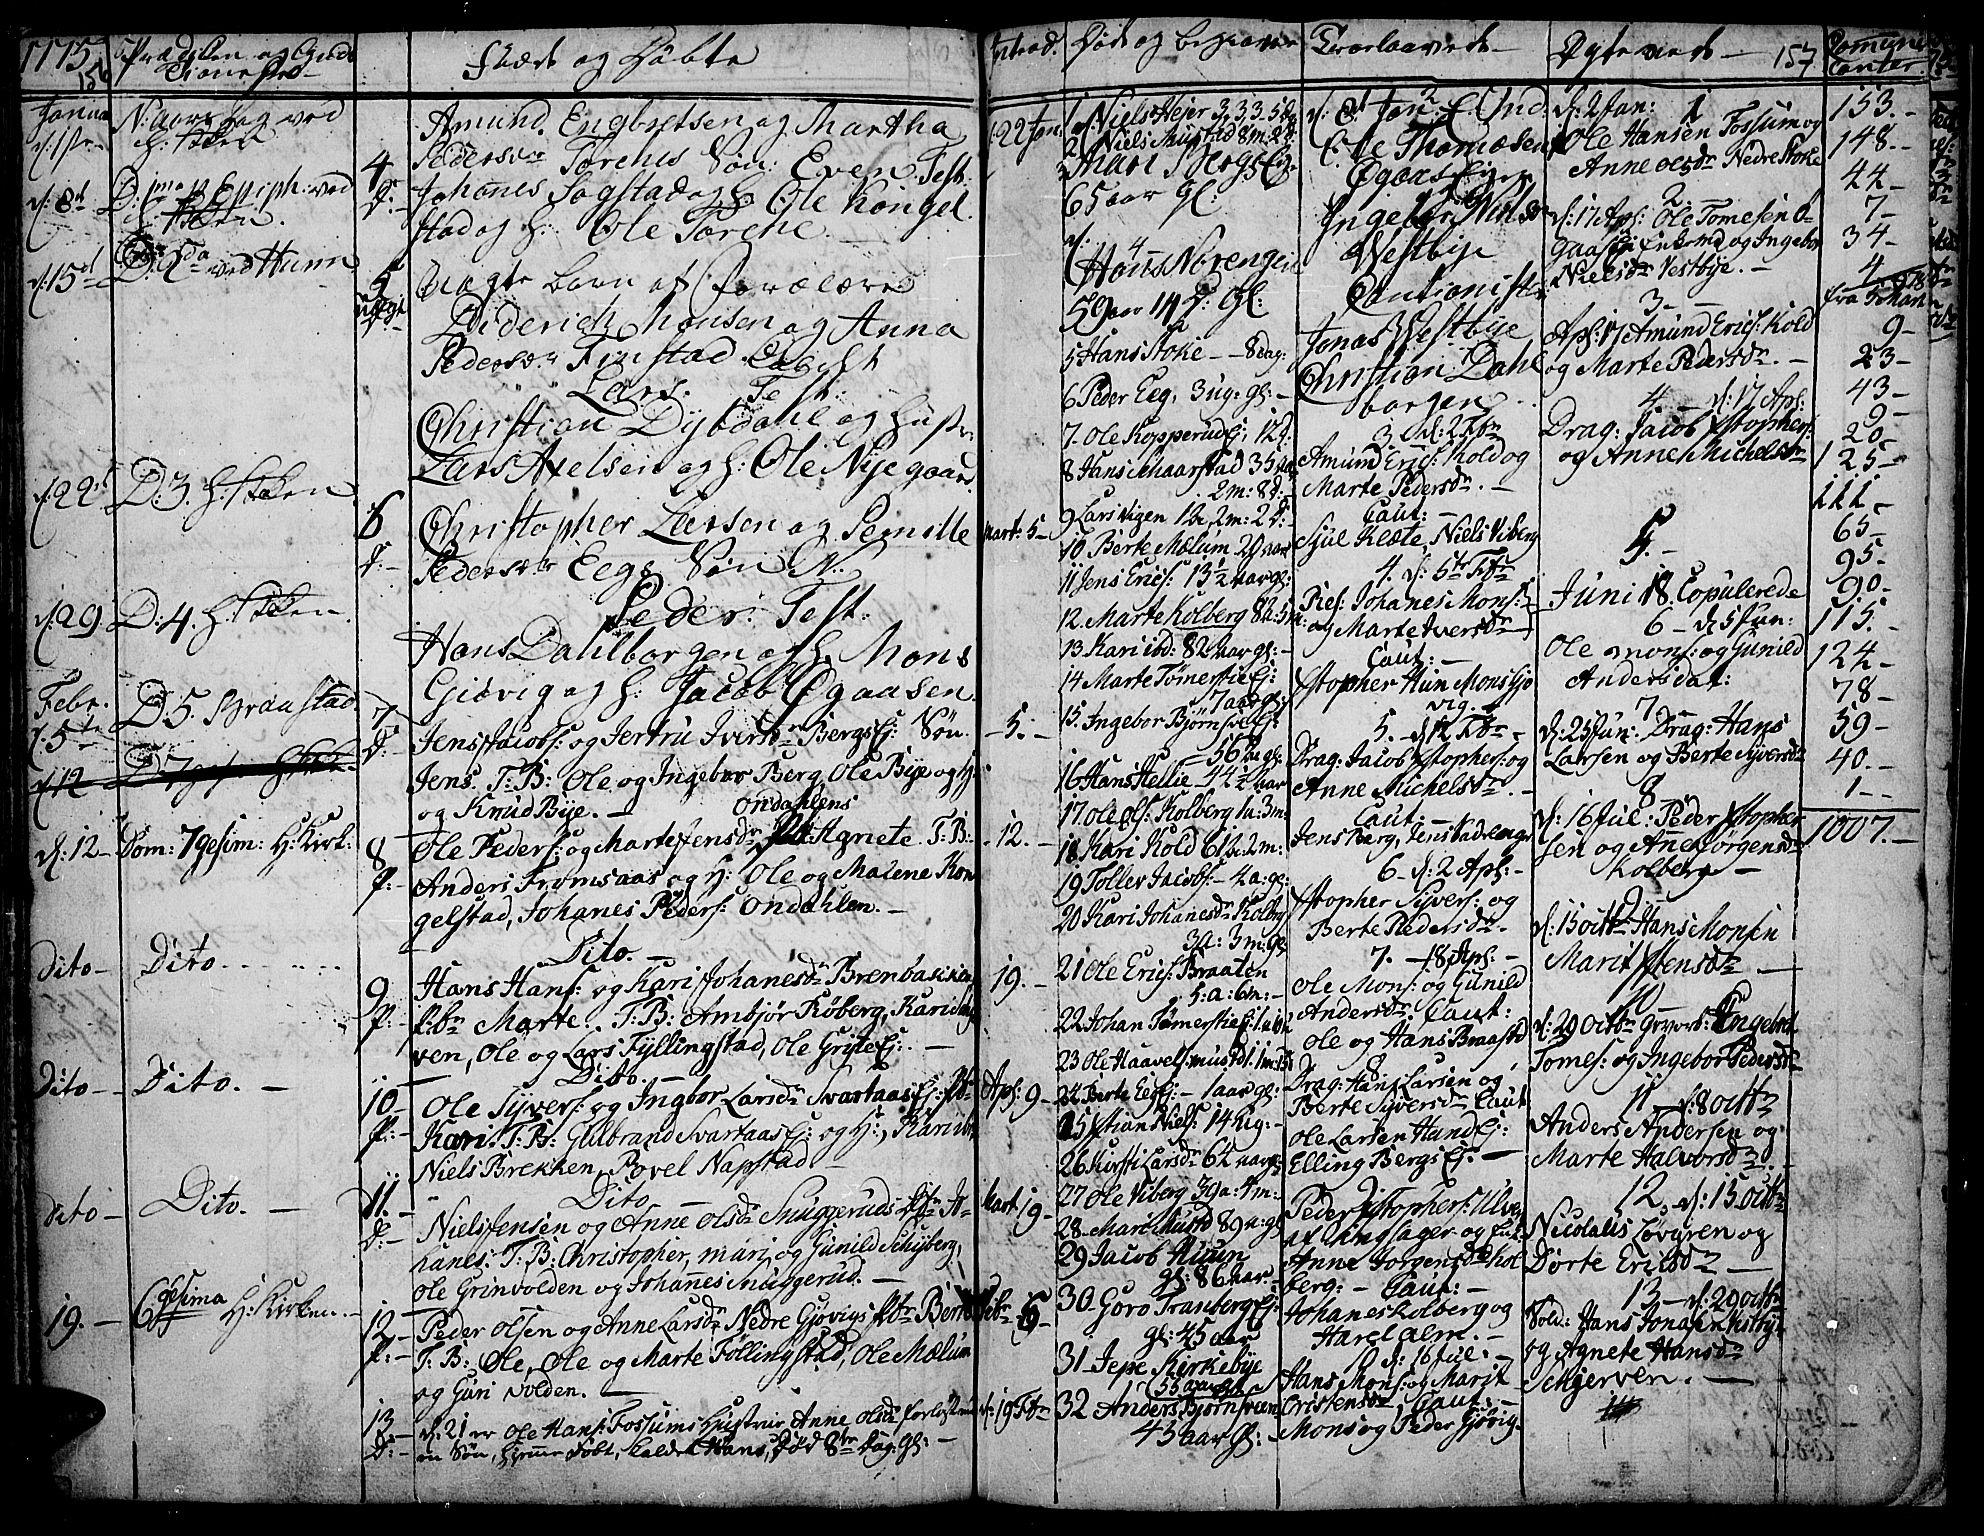 SAH, Vardal prestekontor, H/Ha/Haa/L0002: Ministerialbok nr. 2, 1748-1776, s. 156-157